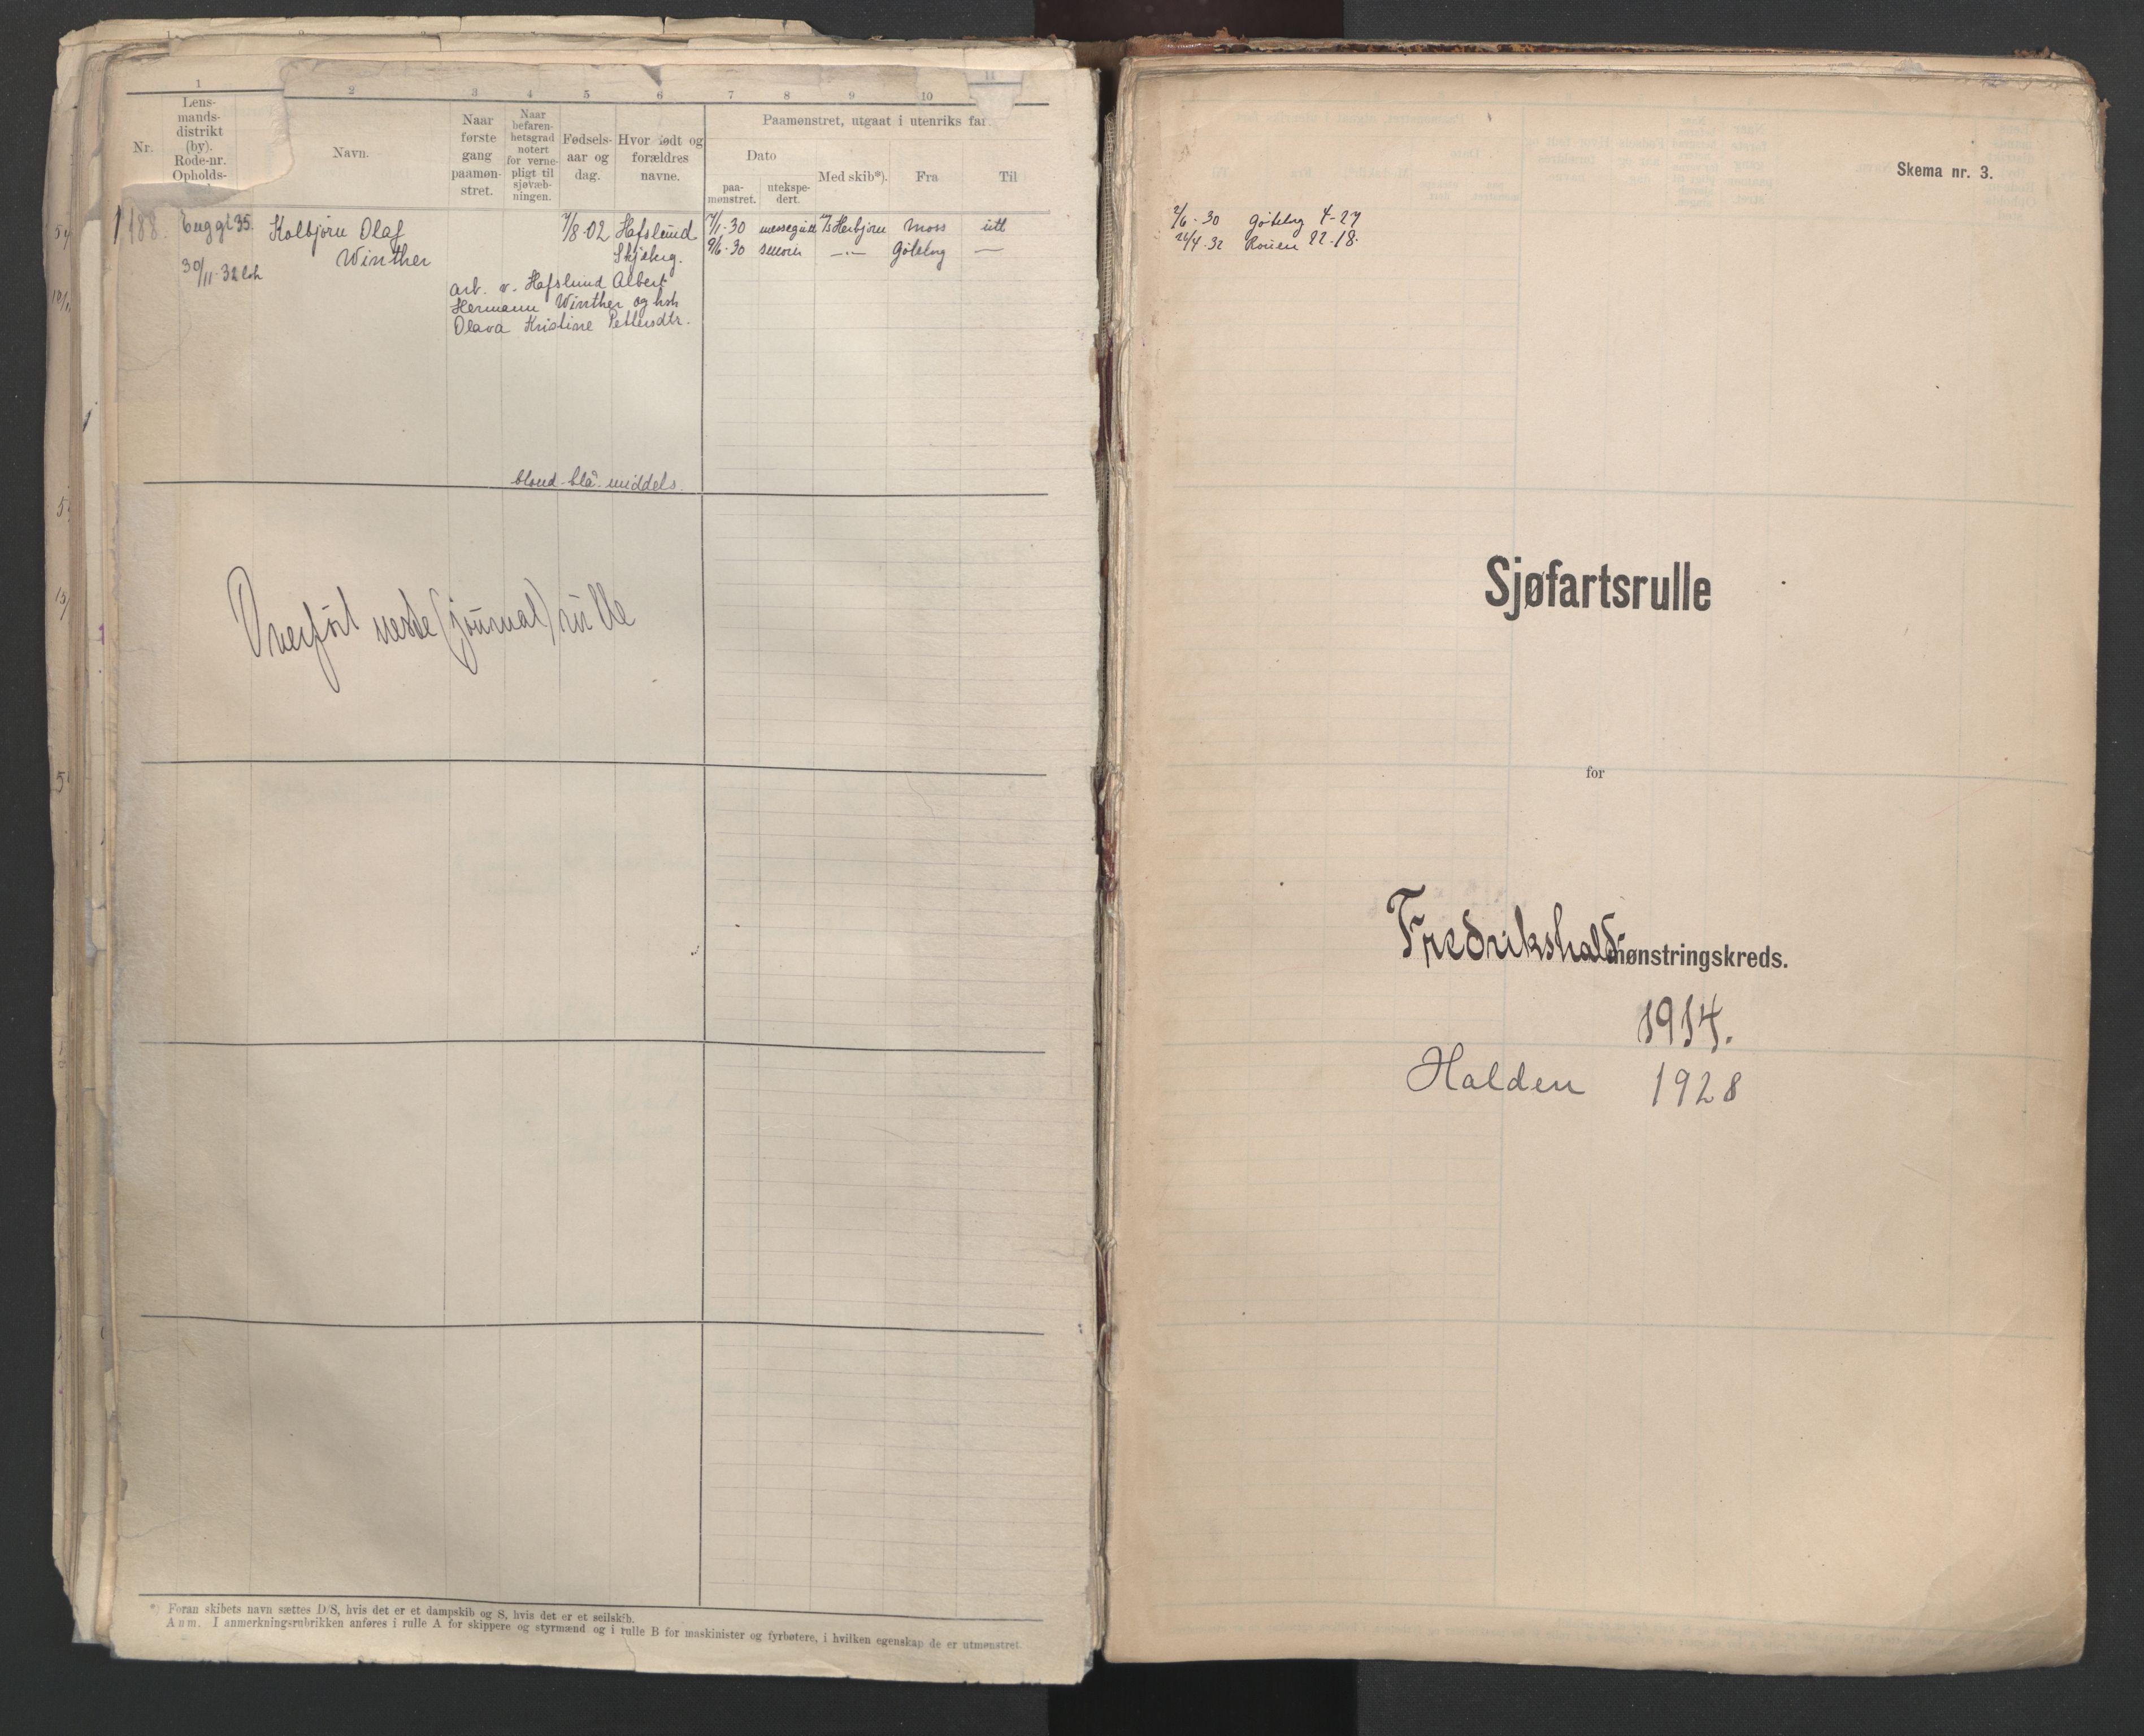 SAO, Oslo sjømannskontor, F/Fd/L0007: B-rulle, 1914, s. 172